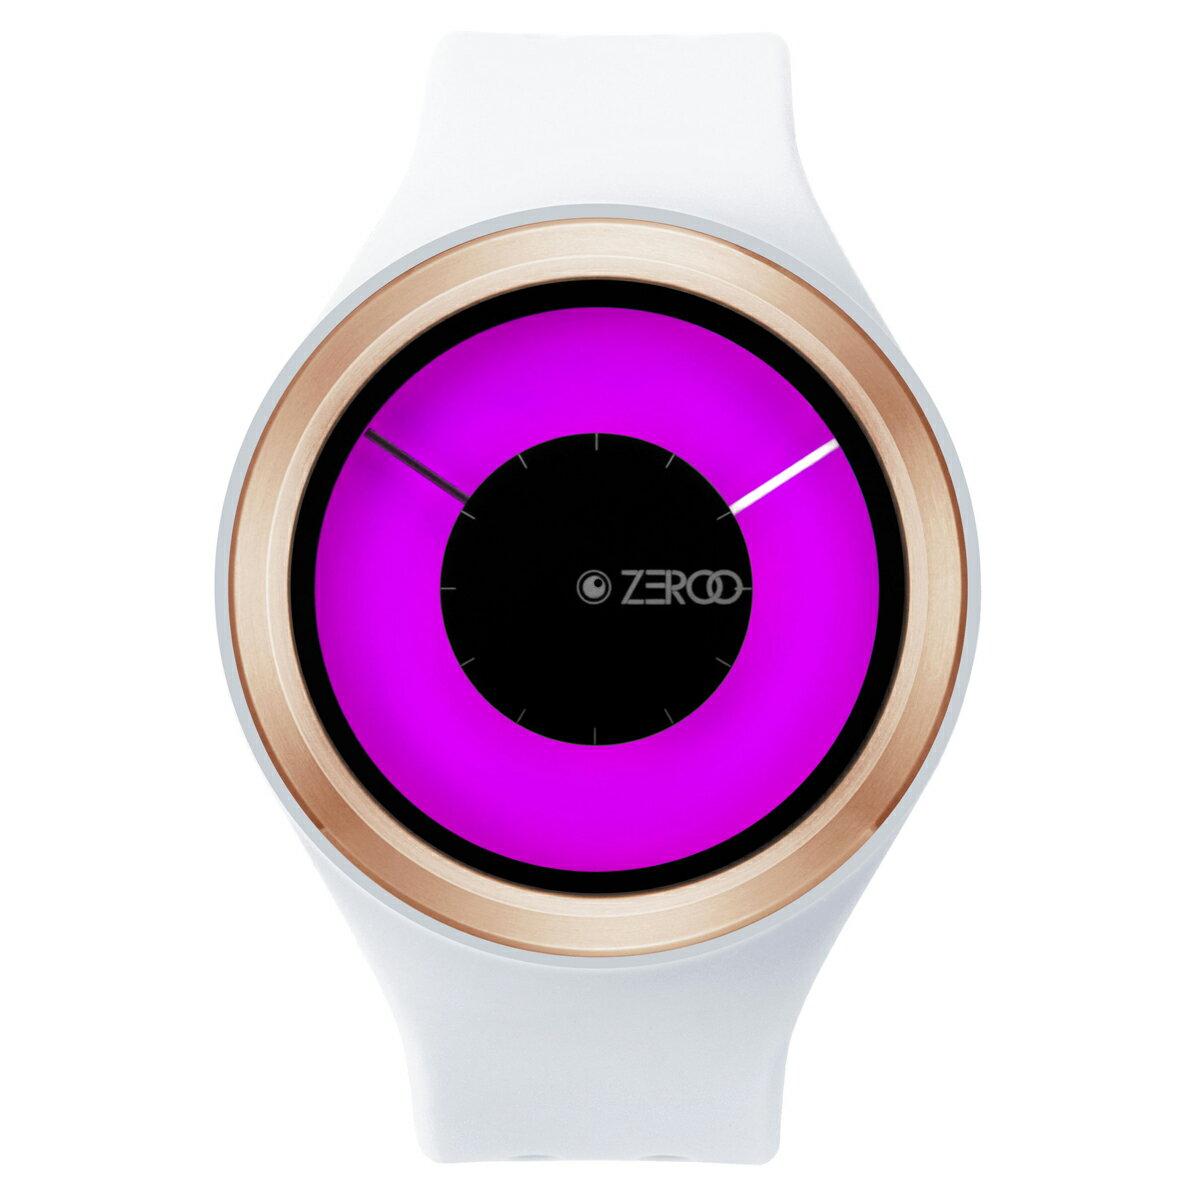 ZEROO MAGIA AURORA ゼロ 電池式クォーツ 腕時計 [W00801B05SR01] ホワイト デザインウォッチ ペア用 メンズ レディース ユニセックス おしゃれ時計 デザイナーズ